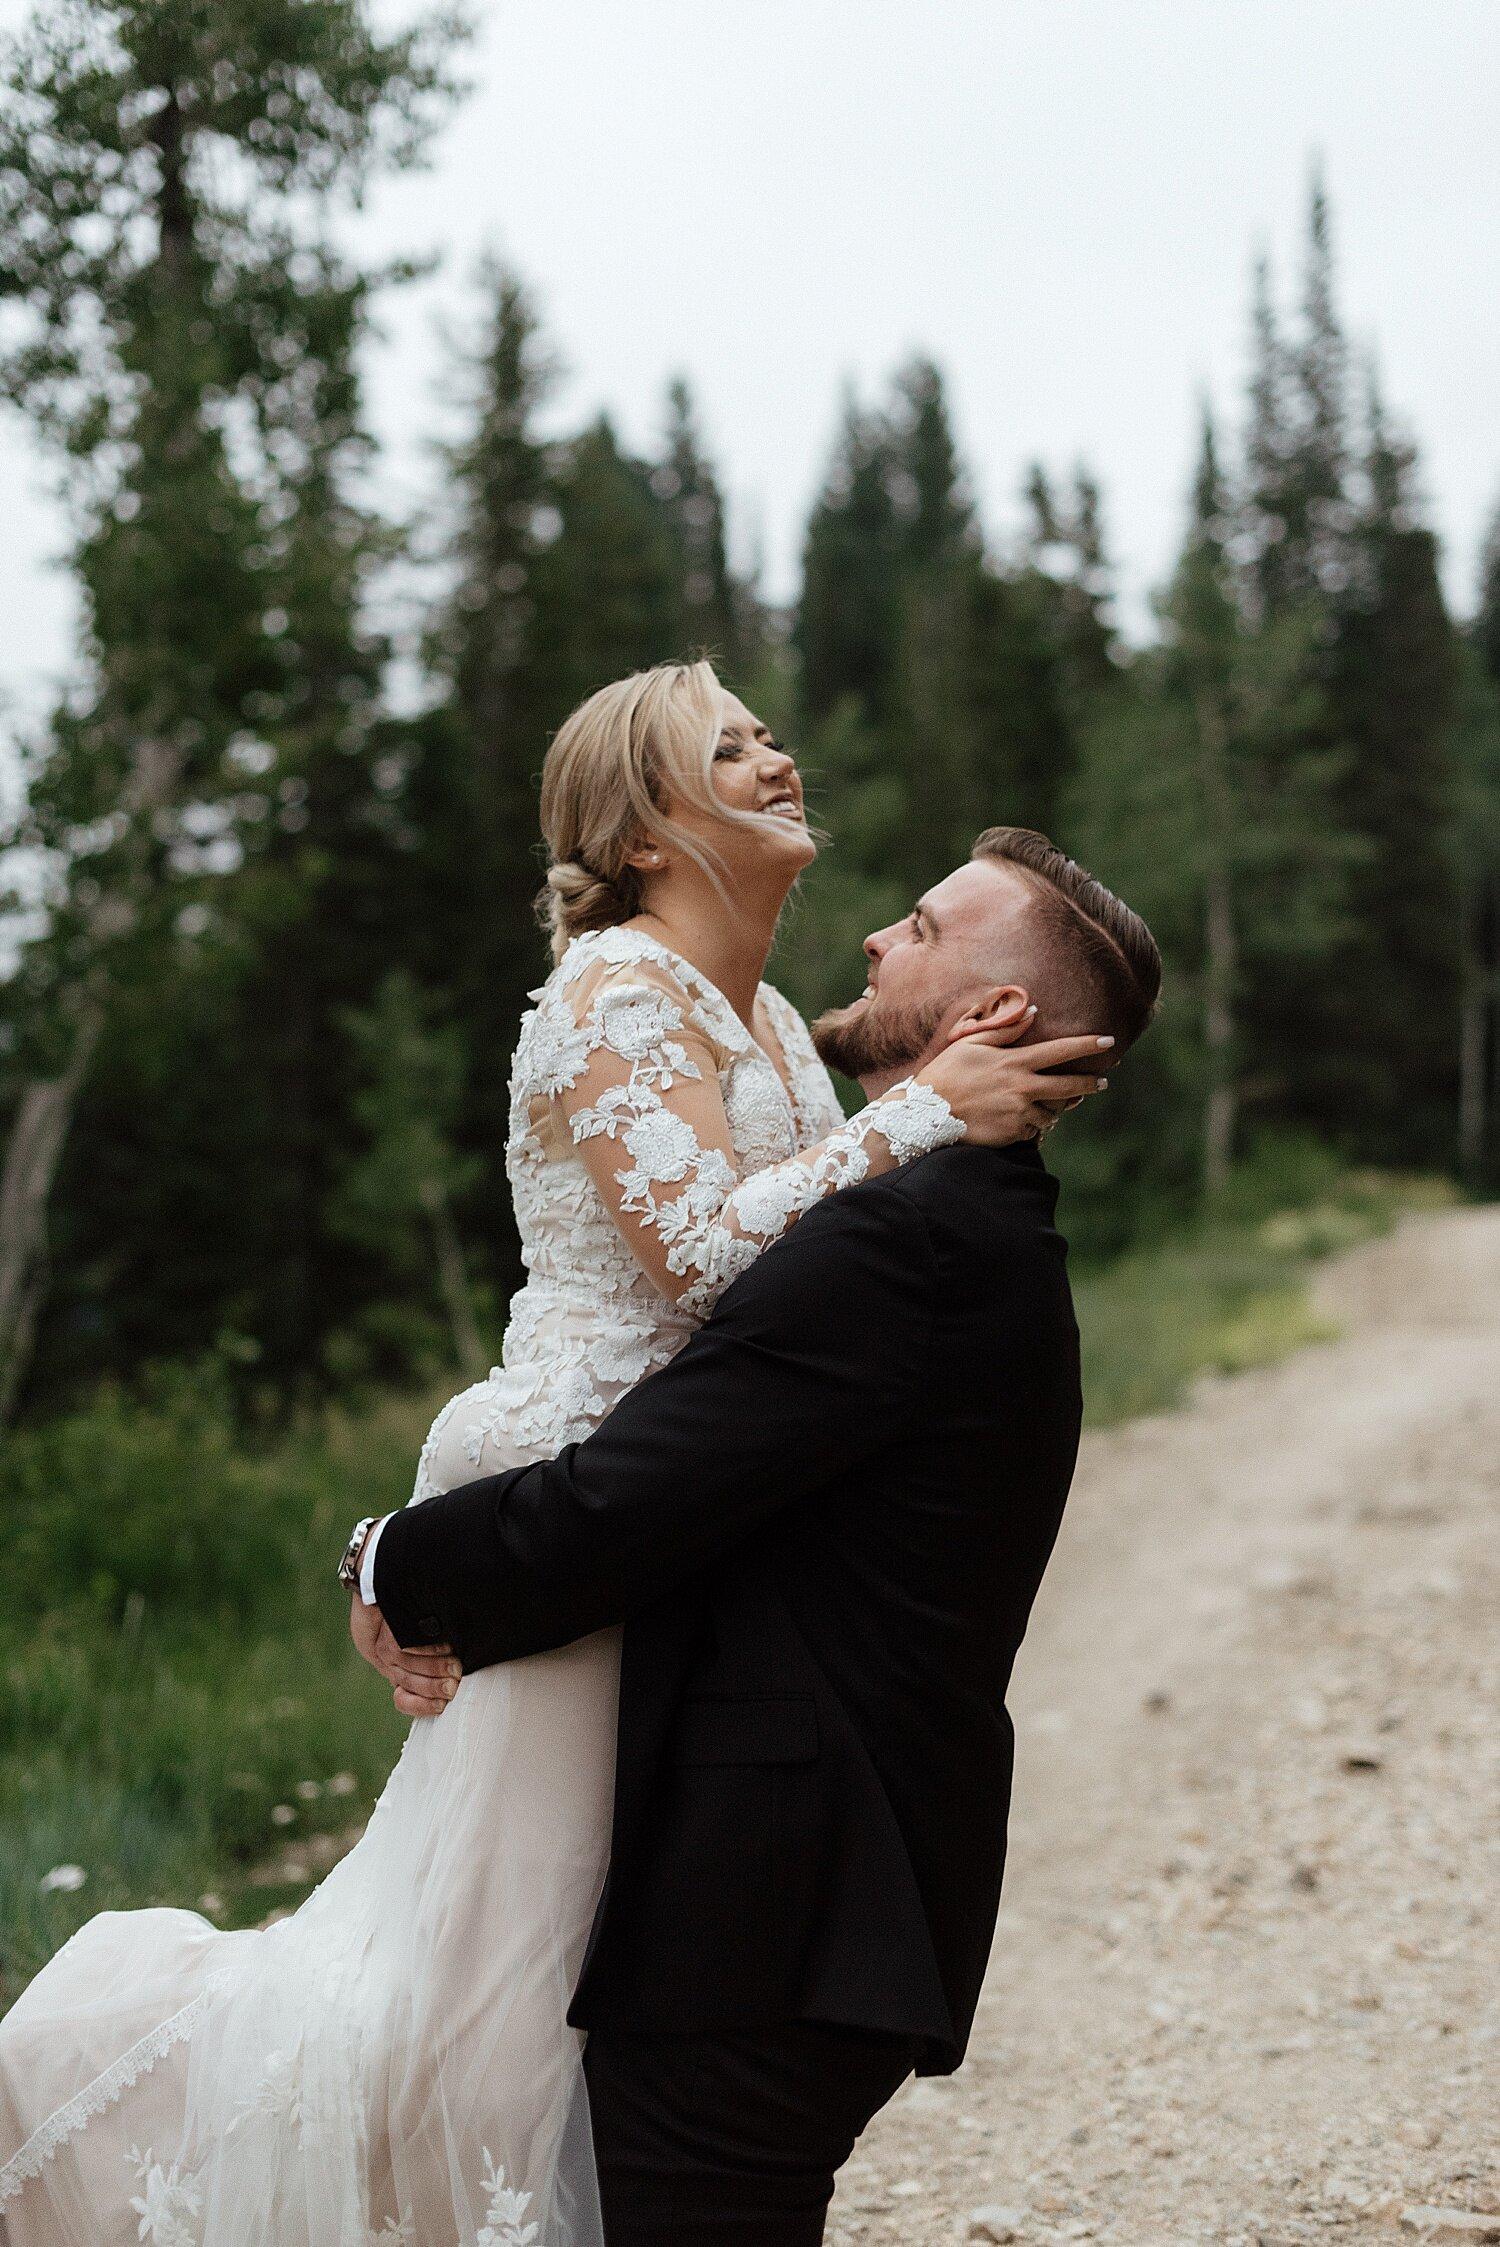 Zandra Barriga Photo - Hunter and Brighton Mountain Bridals_0016.jpg